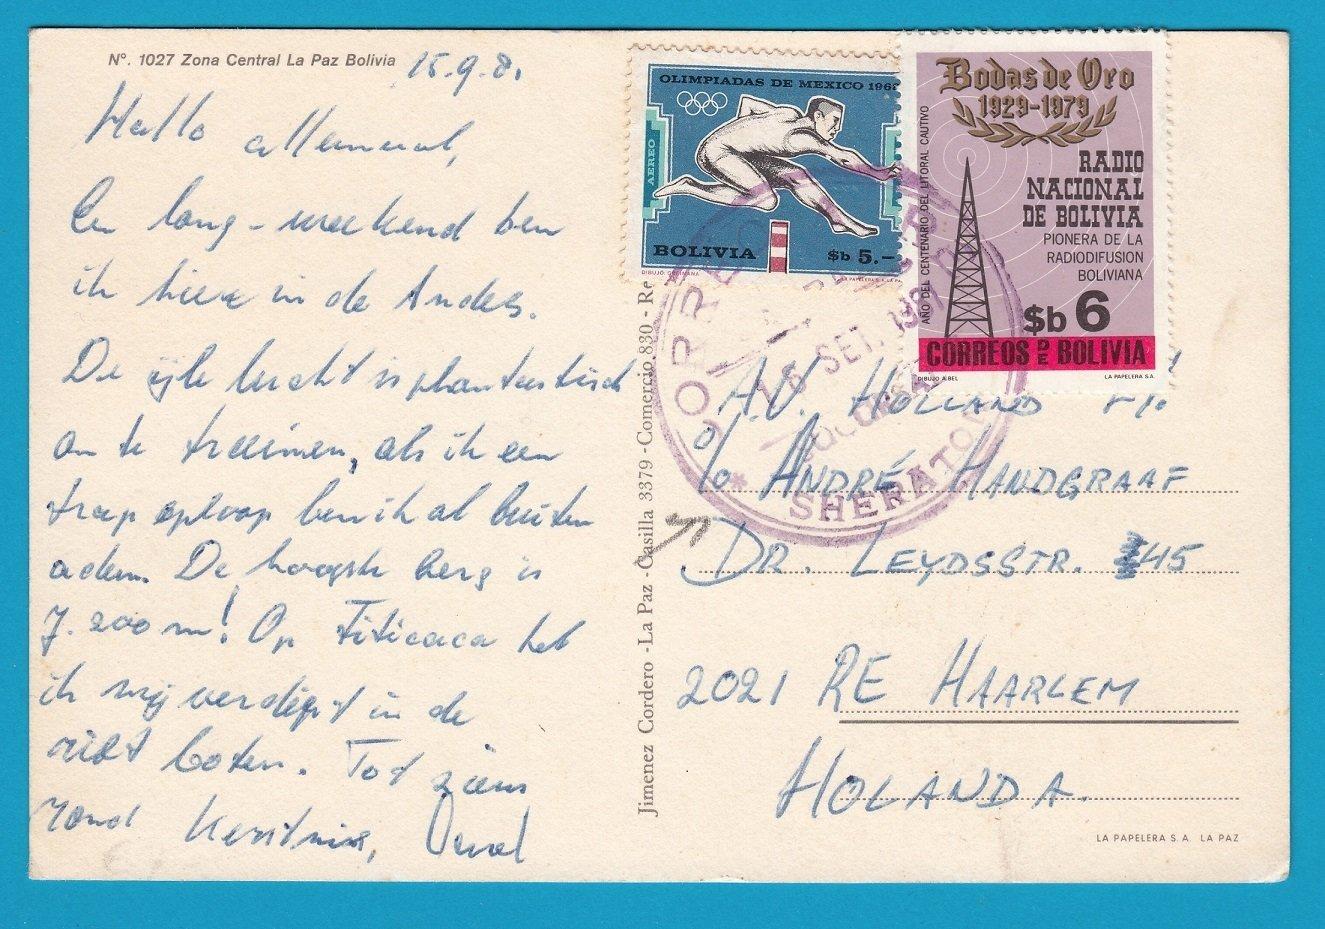 BOLIVIA PPC la Paz 1981 with Sheraton Hotel cancel to Netherlands